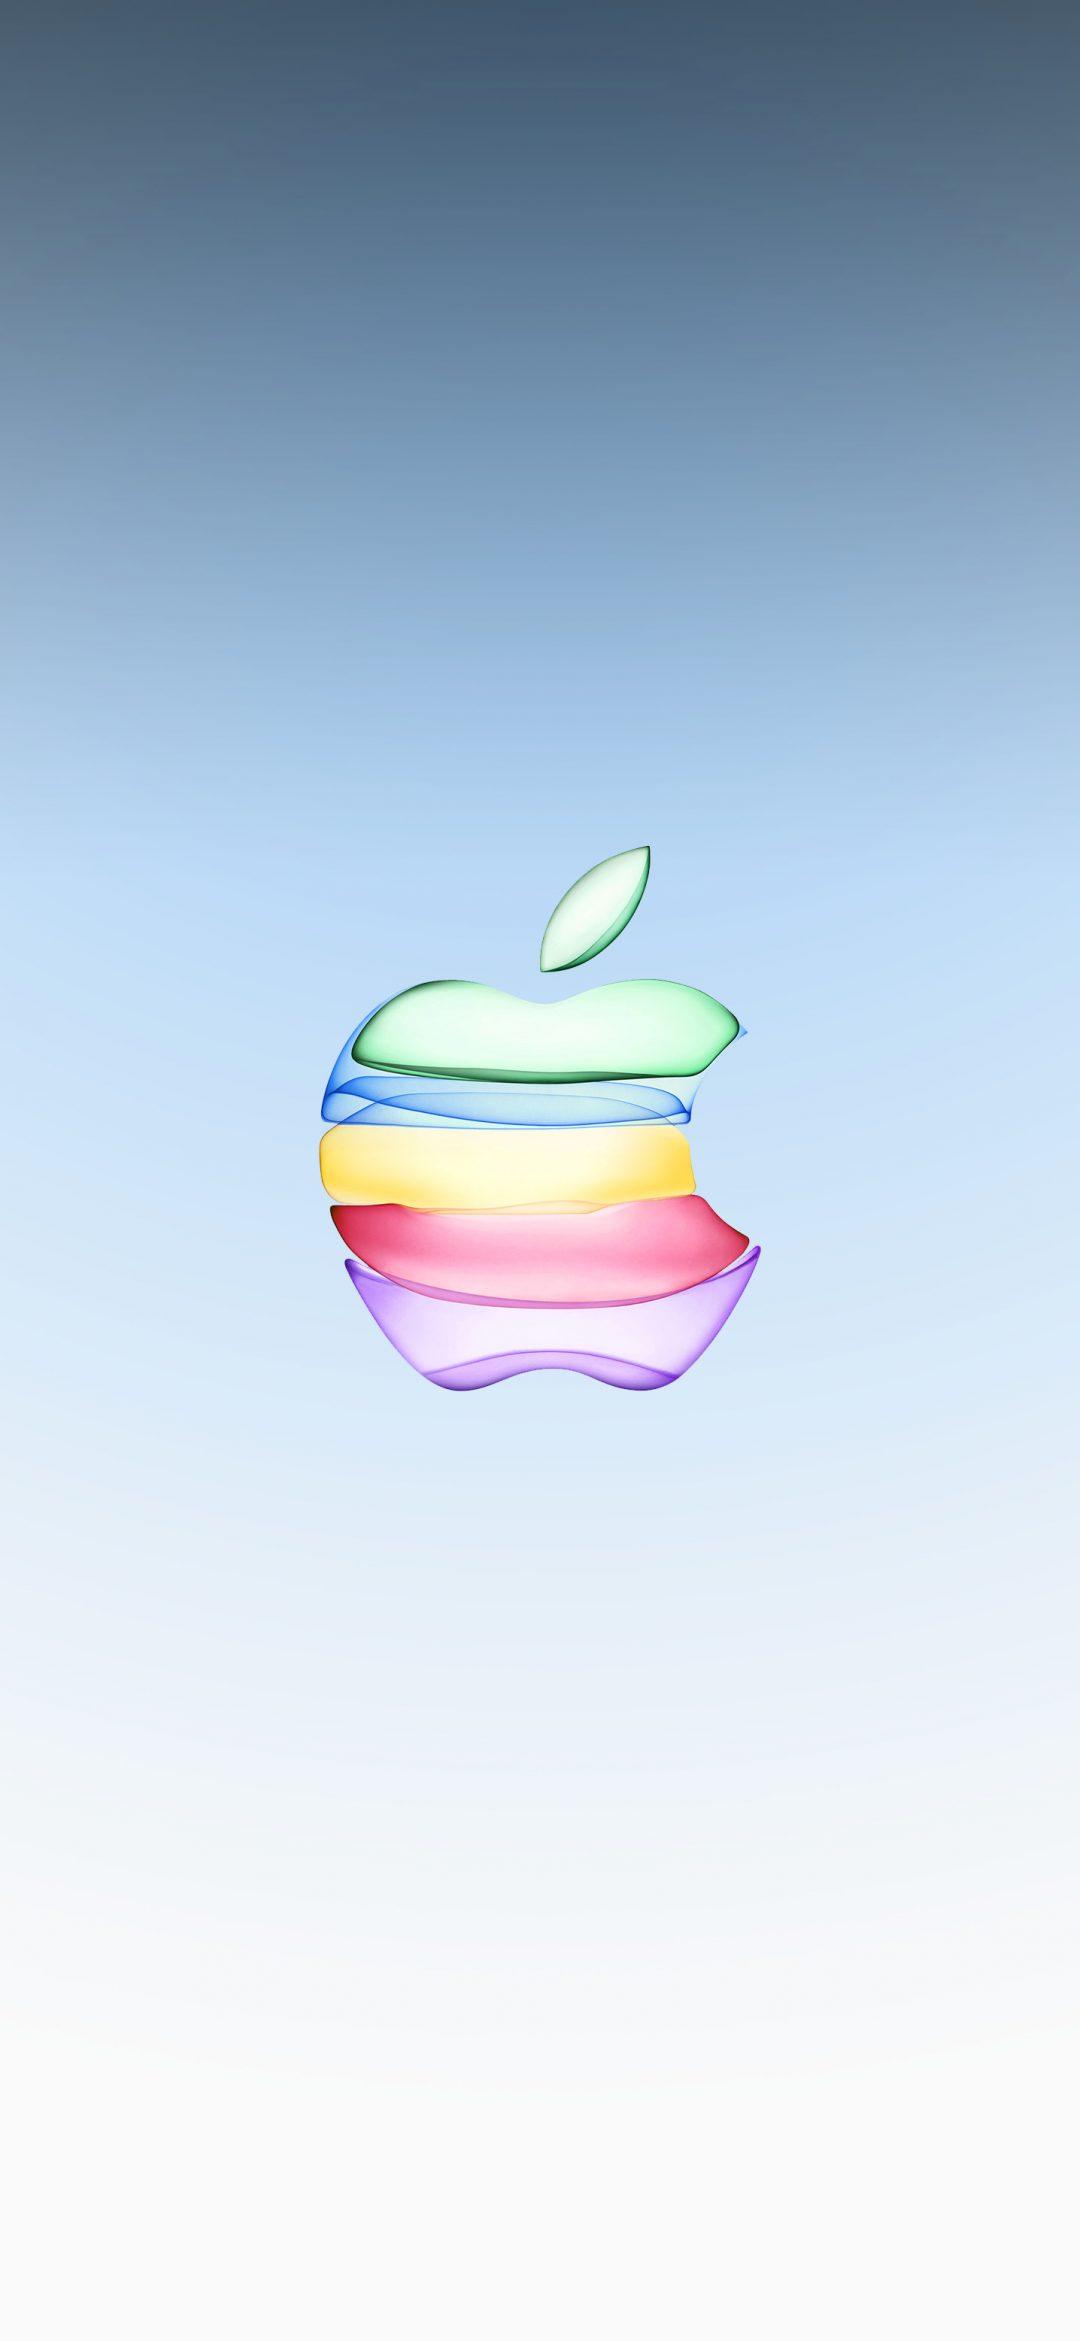 iphone-11-default-wallpaper-ardroiding-14